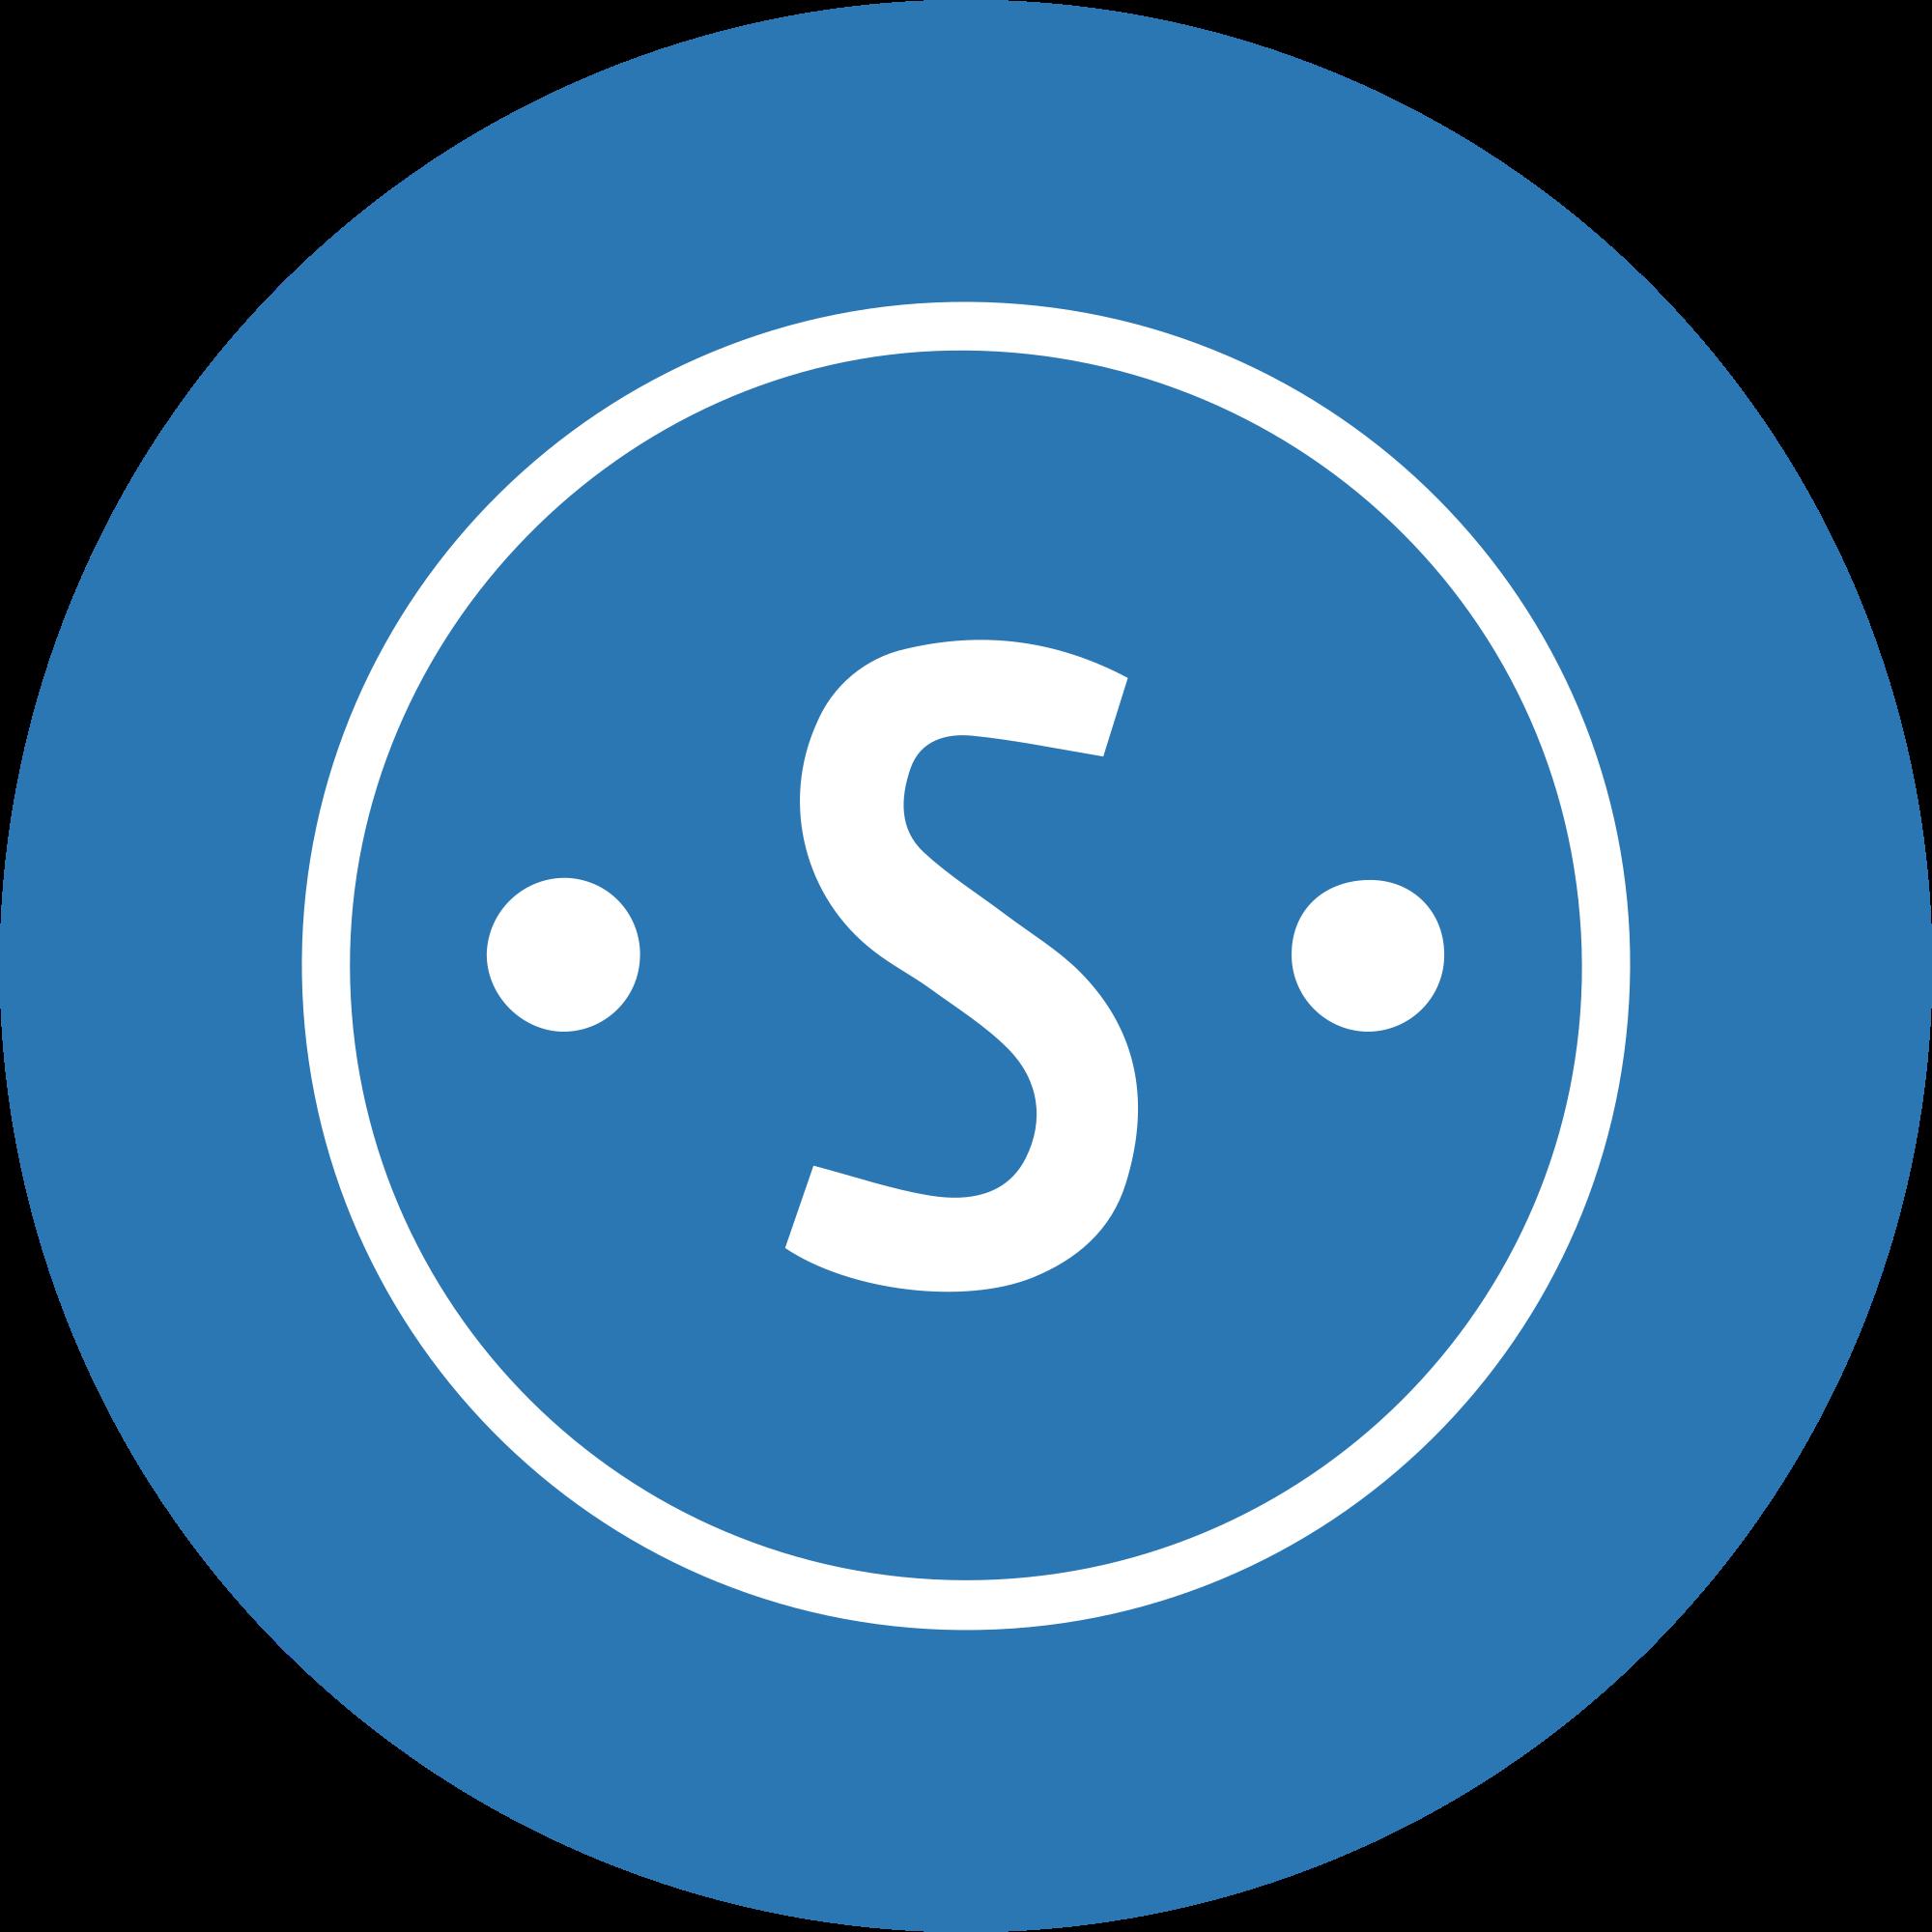 San-Sient